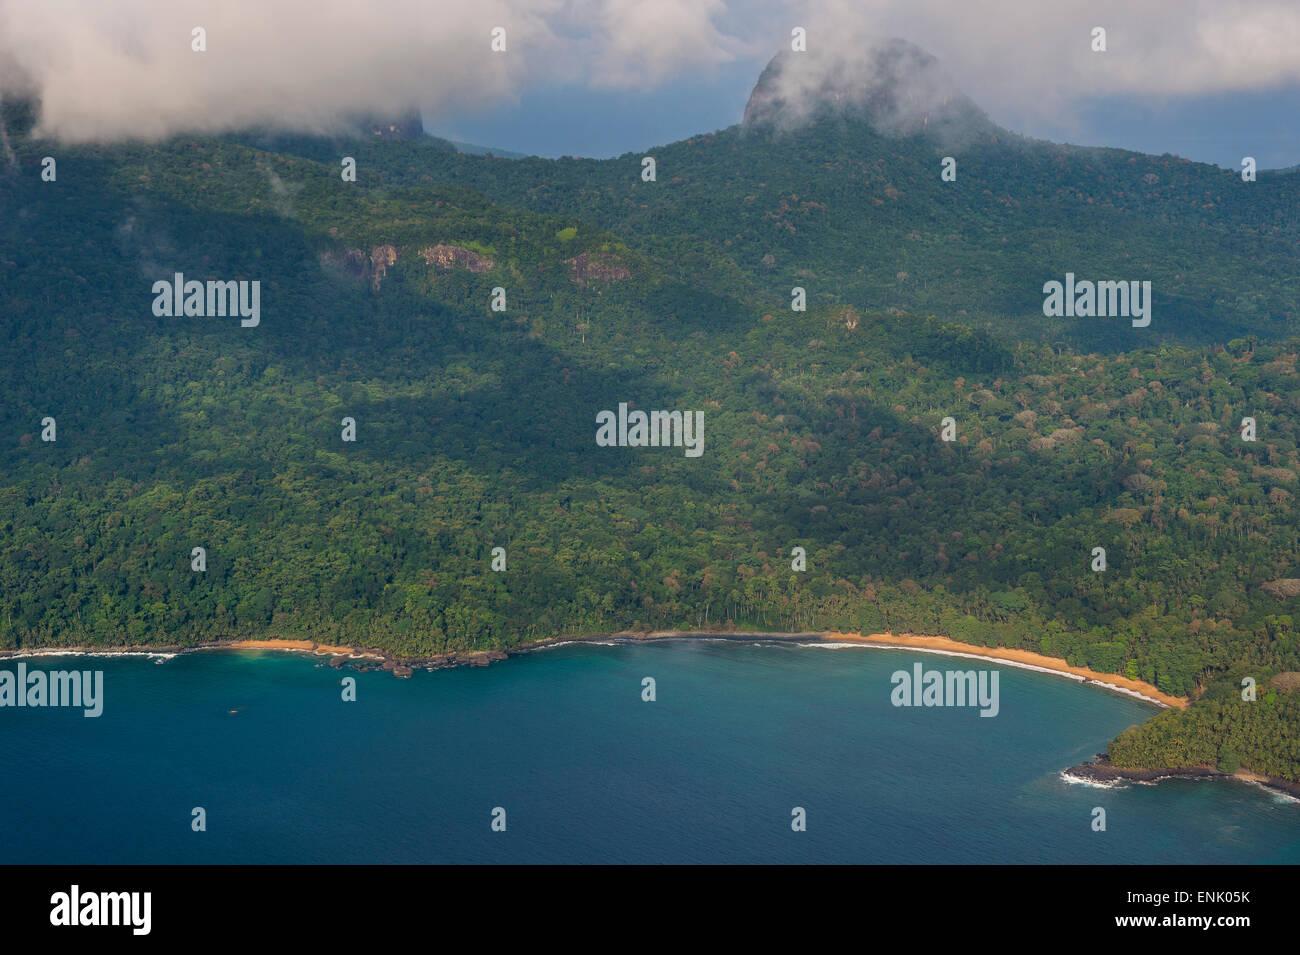 Aerial view of the UNESCO Biosphere Reserve, Principe, Sao Tome and Principe, Atlantic Ocean, Africa - Stock Image